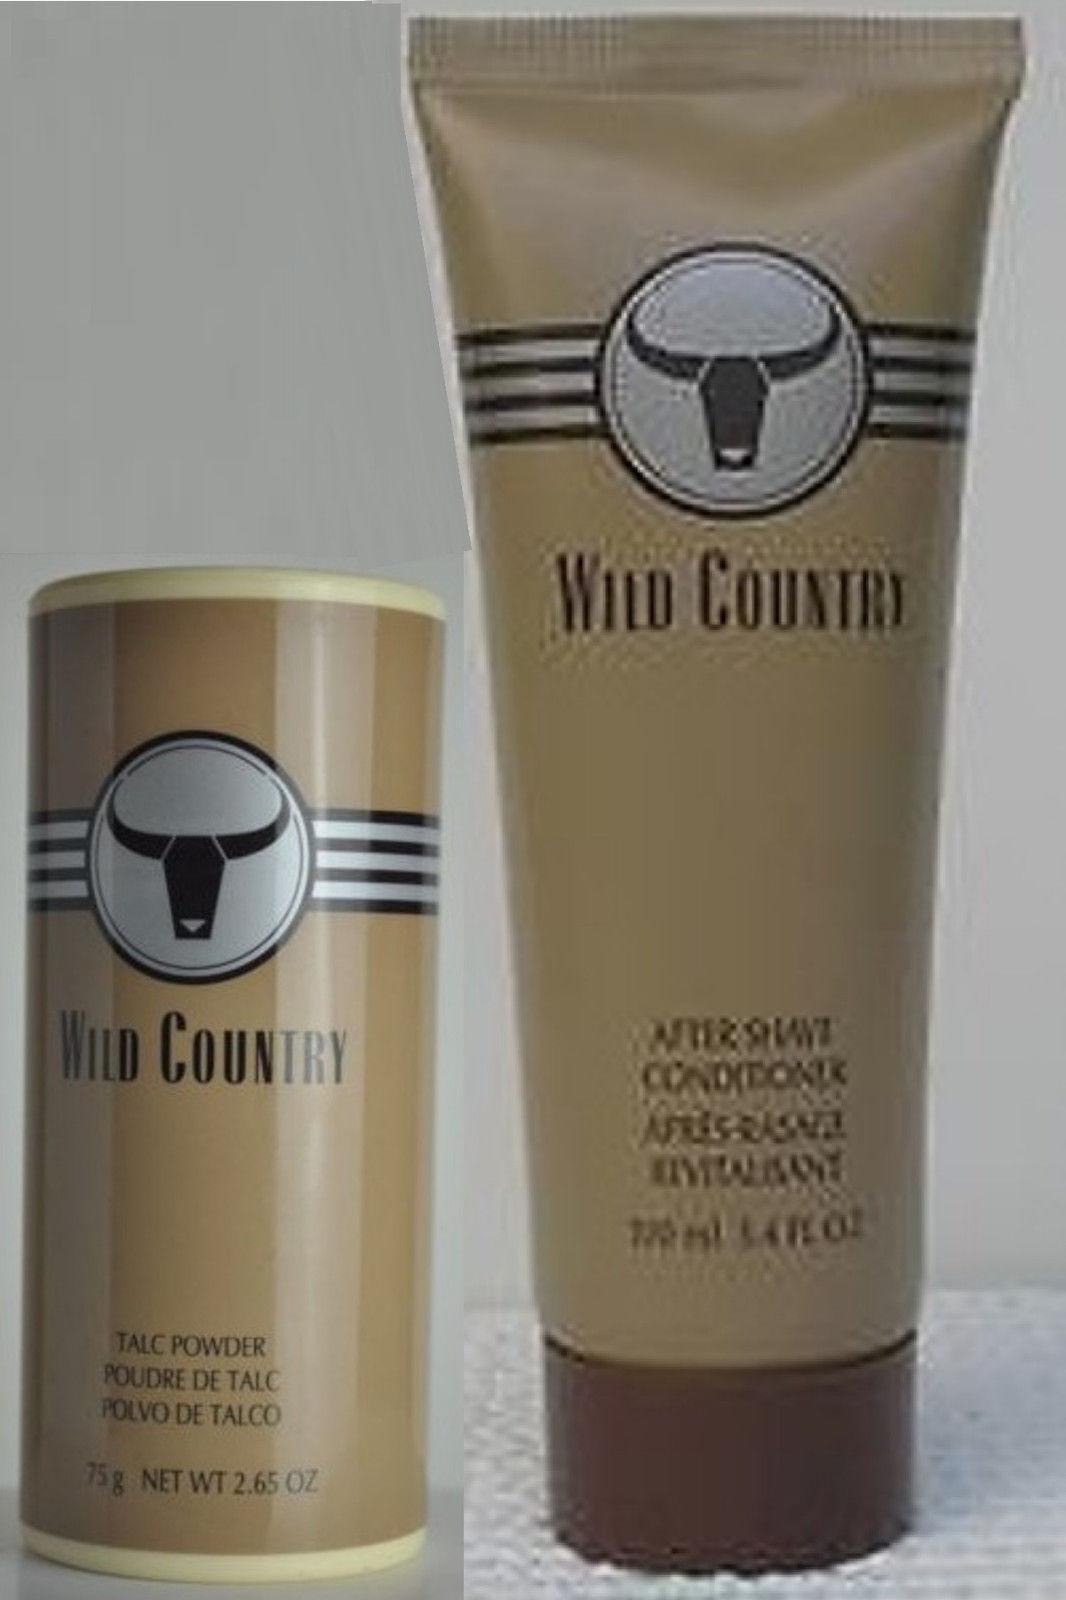 1 Avon Wild Country After Shave Conditioner + 1 Avon Wild Country Talc Powder